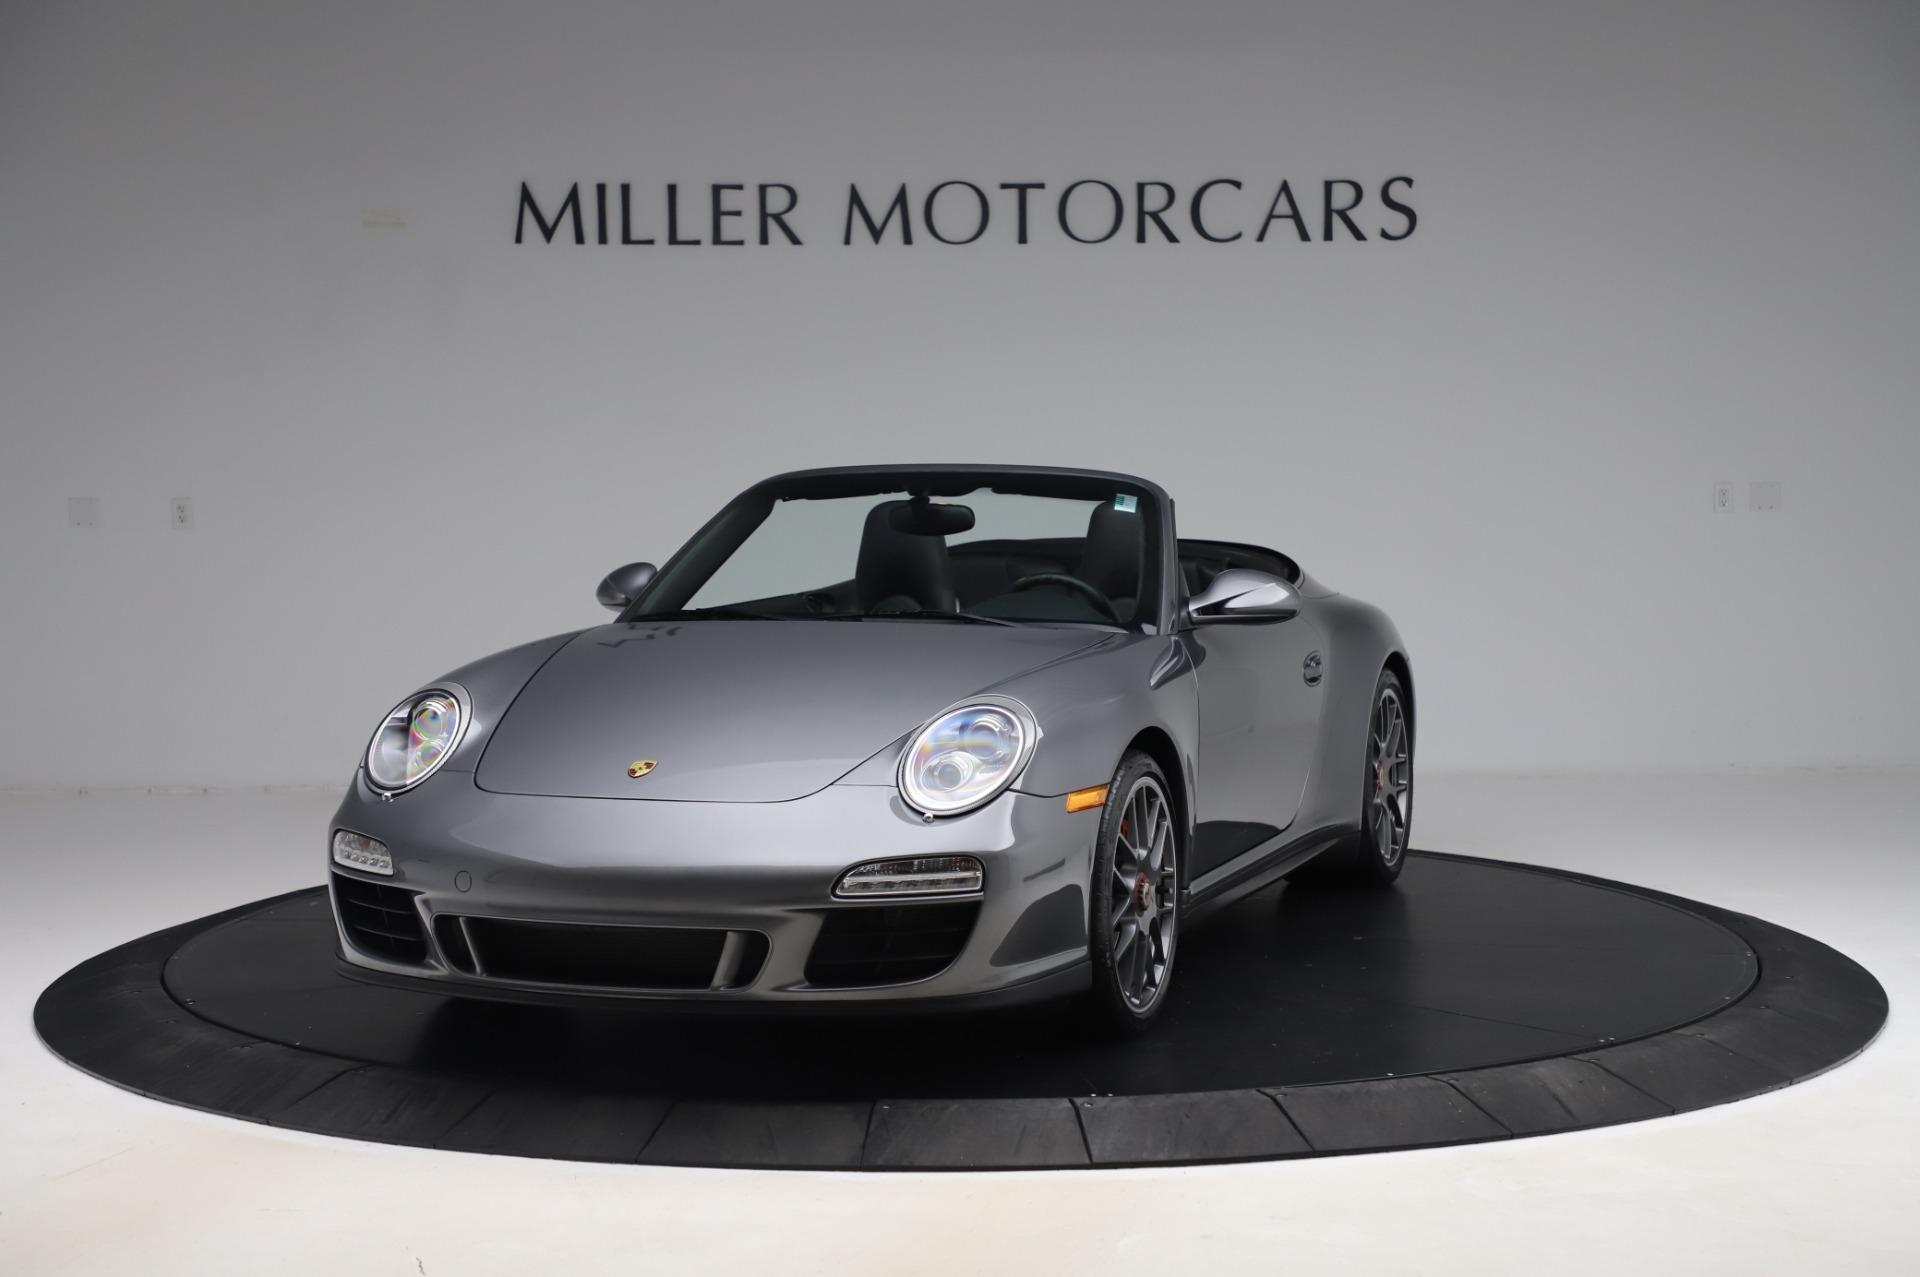 Used 2012 Porsche 911 Carrera 4 GTS for sale $79,900 at Alfa Romeo of Greenwich in Greenwich CT 06830 1